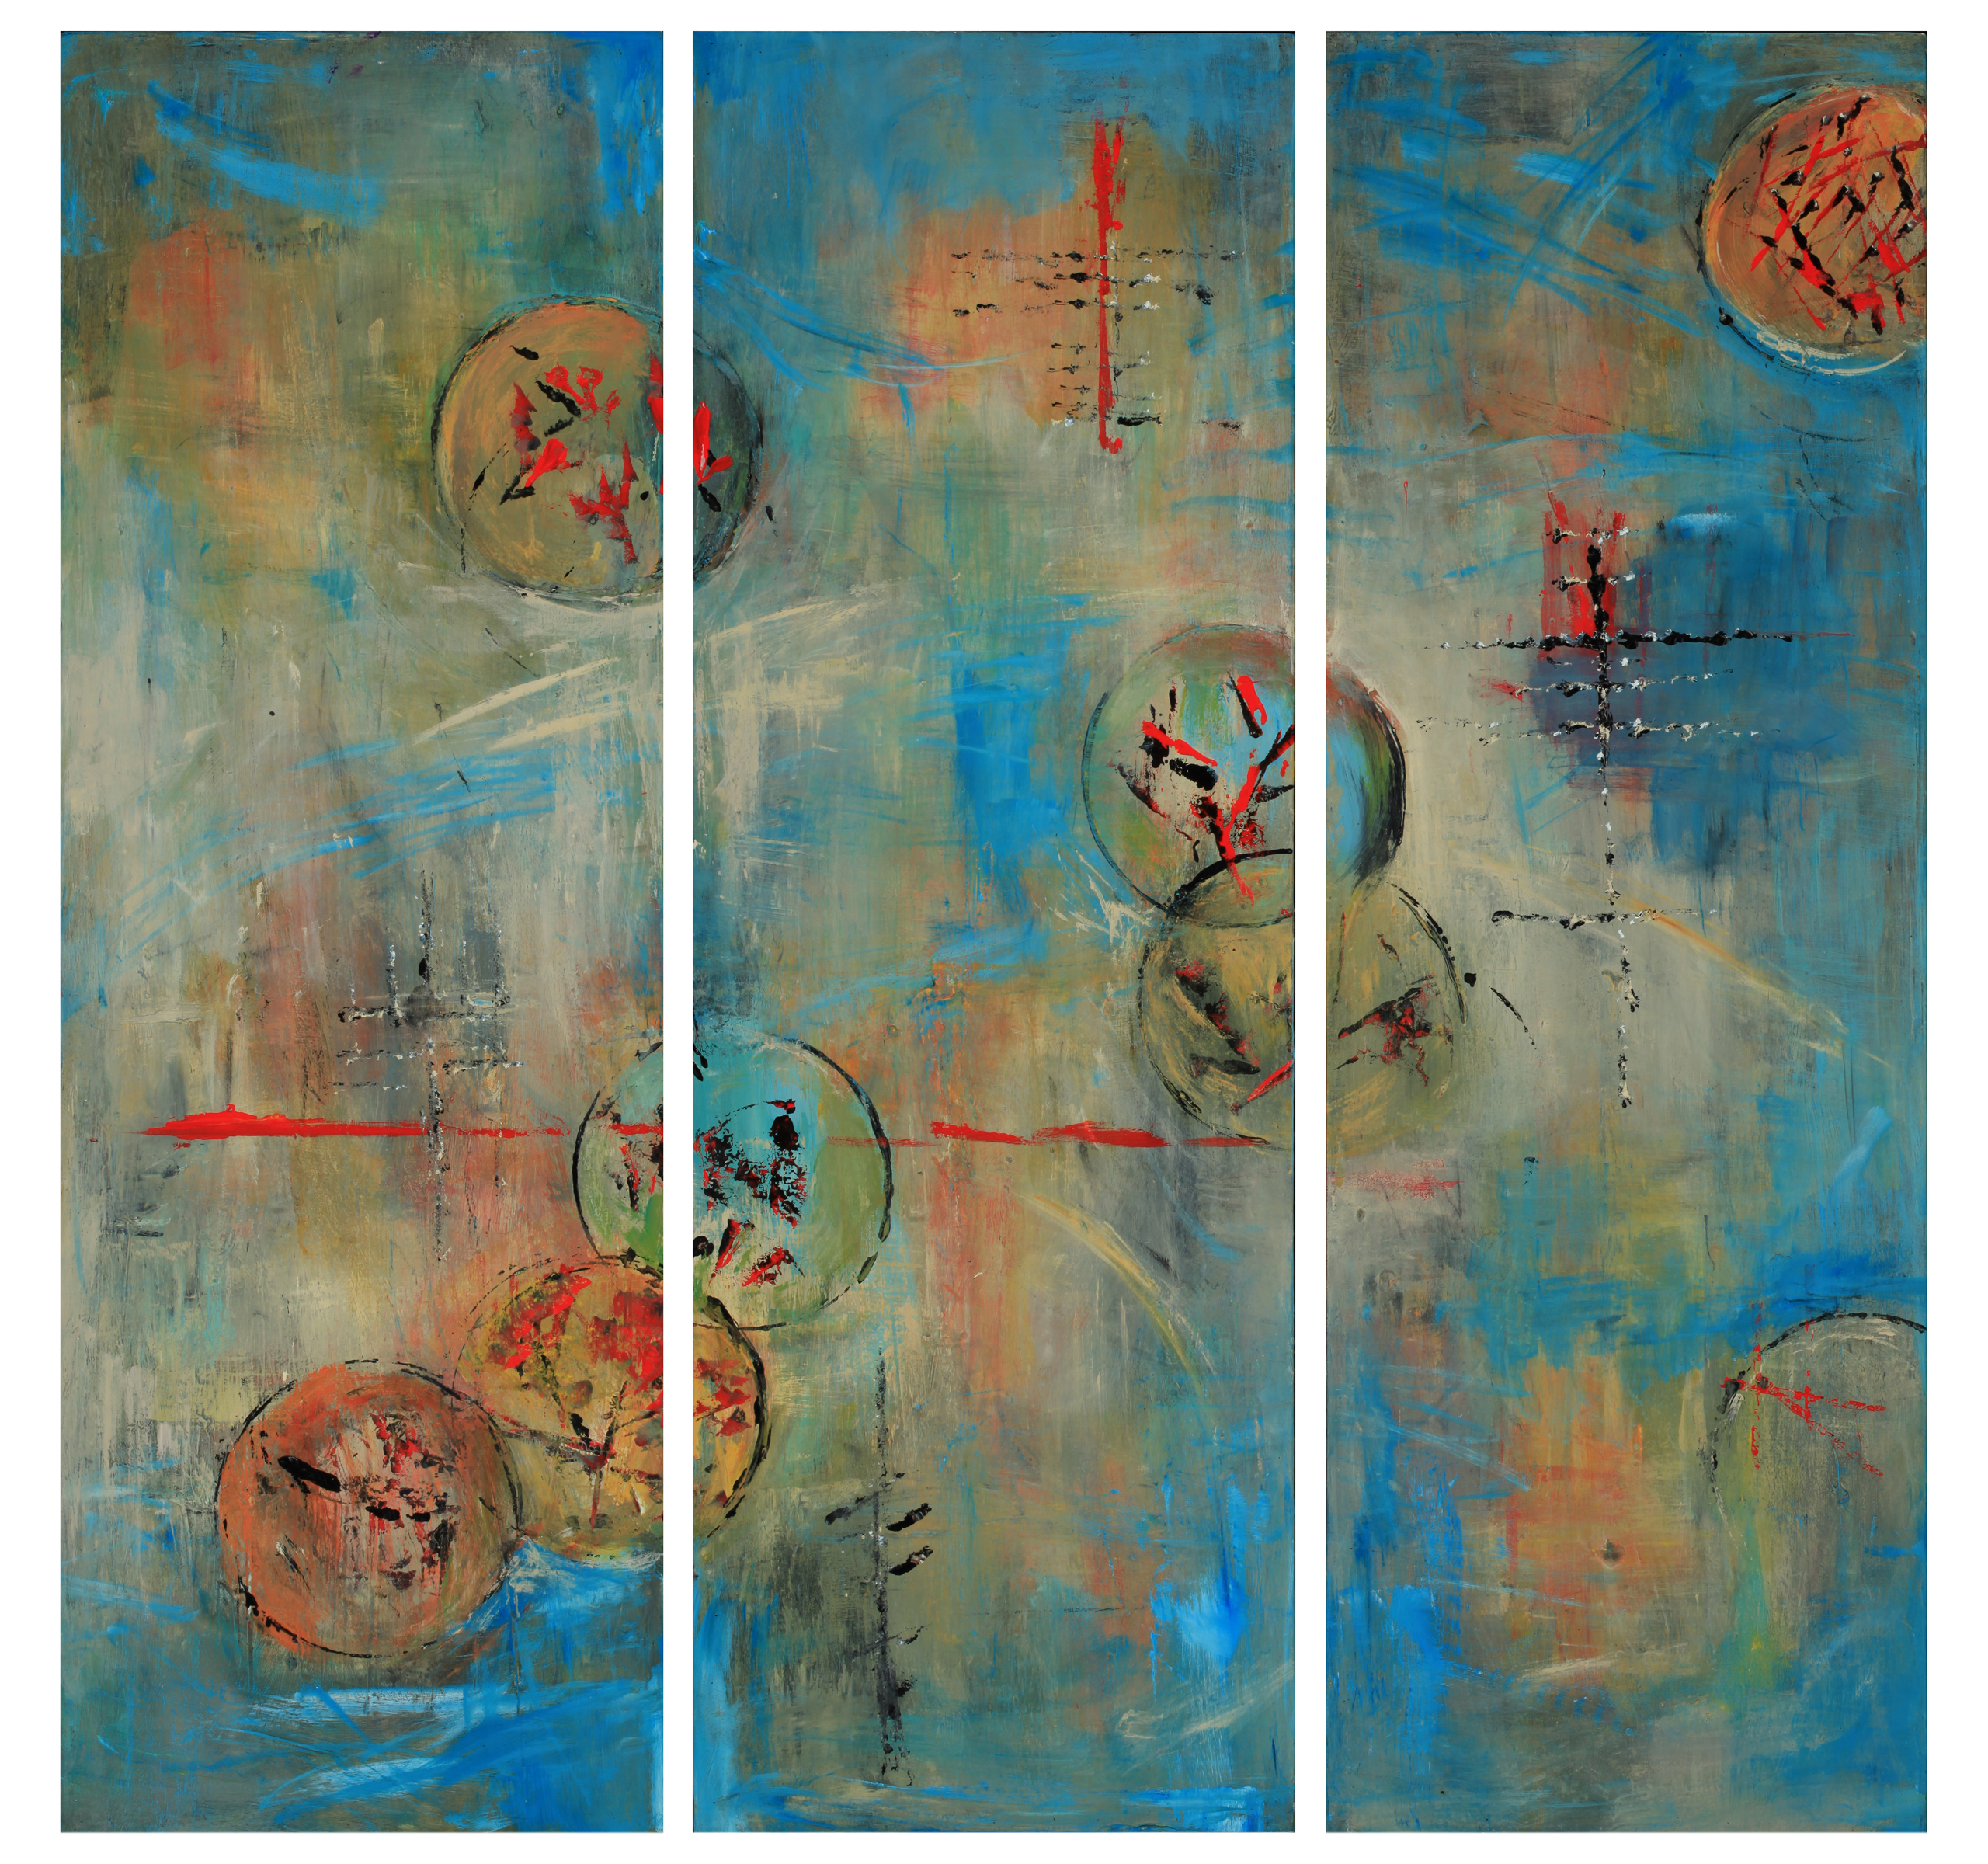 mystical-hues-series-on-wood